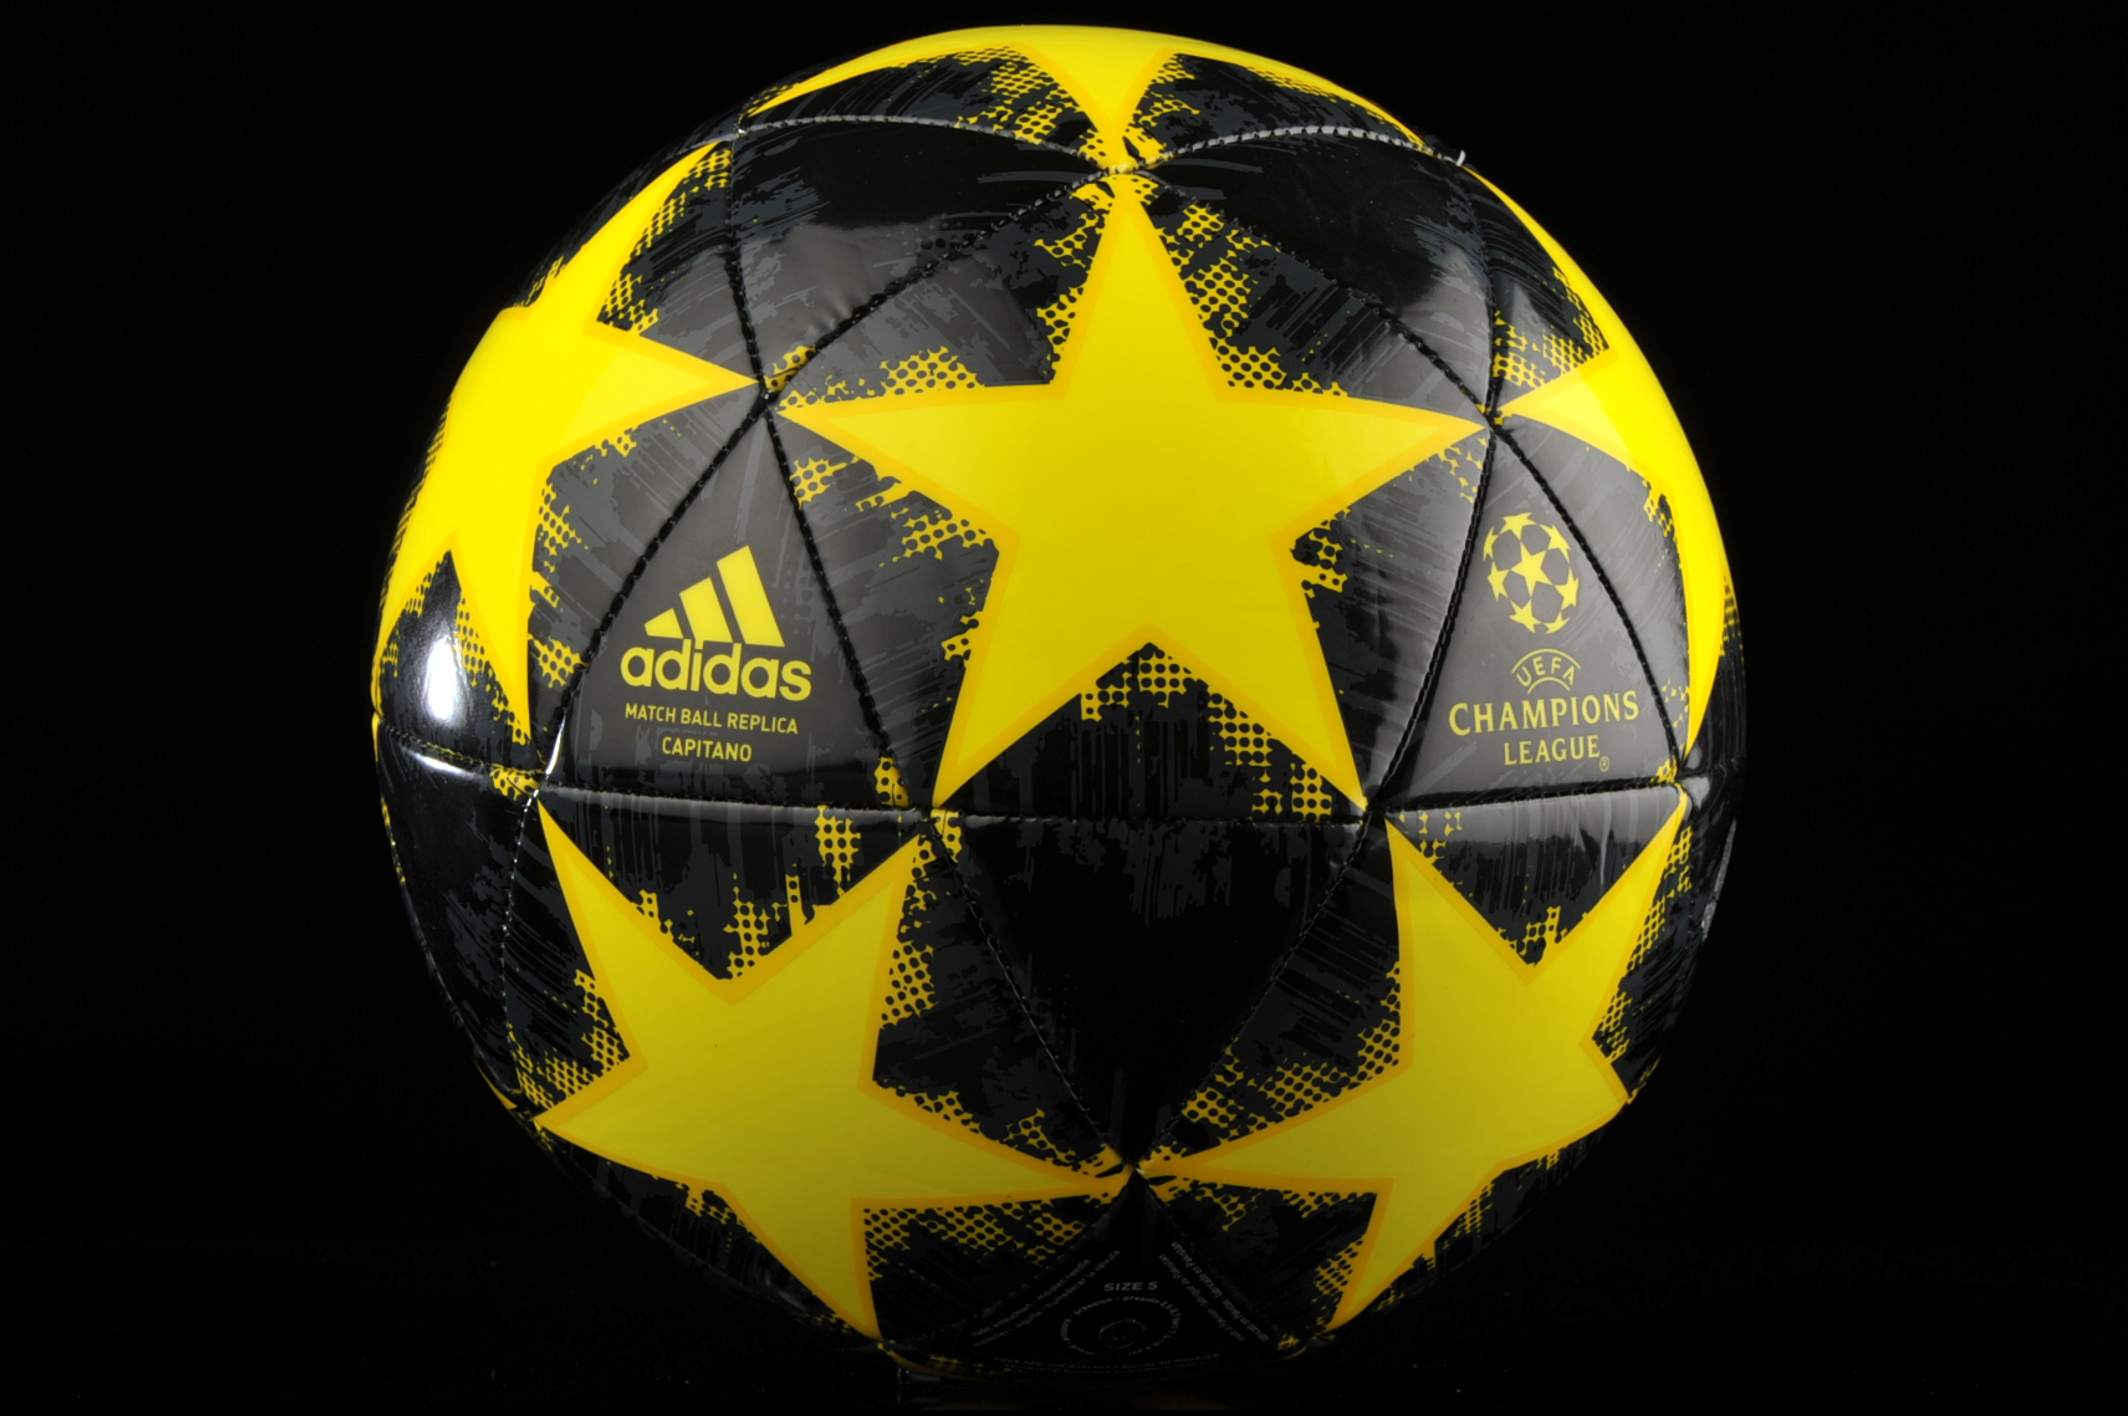 inteligente Shuraba acantilado  Football adidas Finale 18 Juventus Capitano CW4144 size 5 | R-GOL.com -  Football boots & equipment